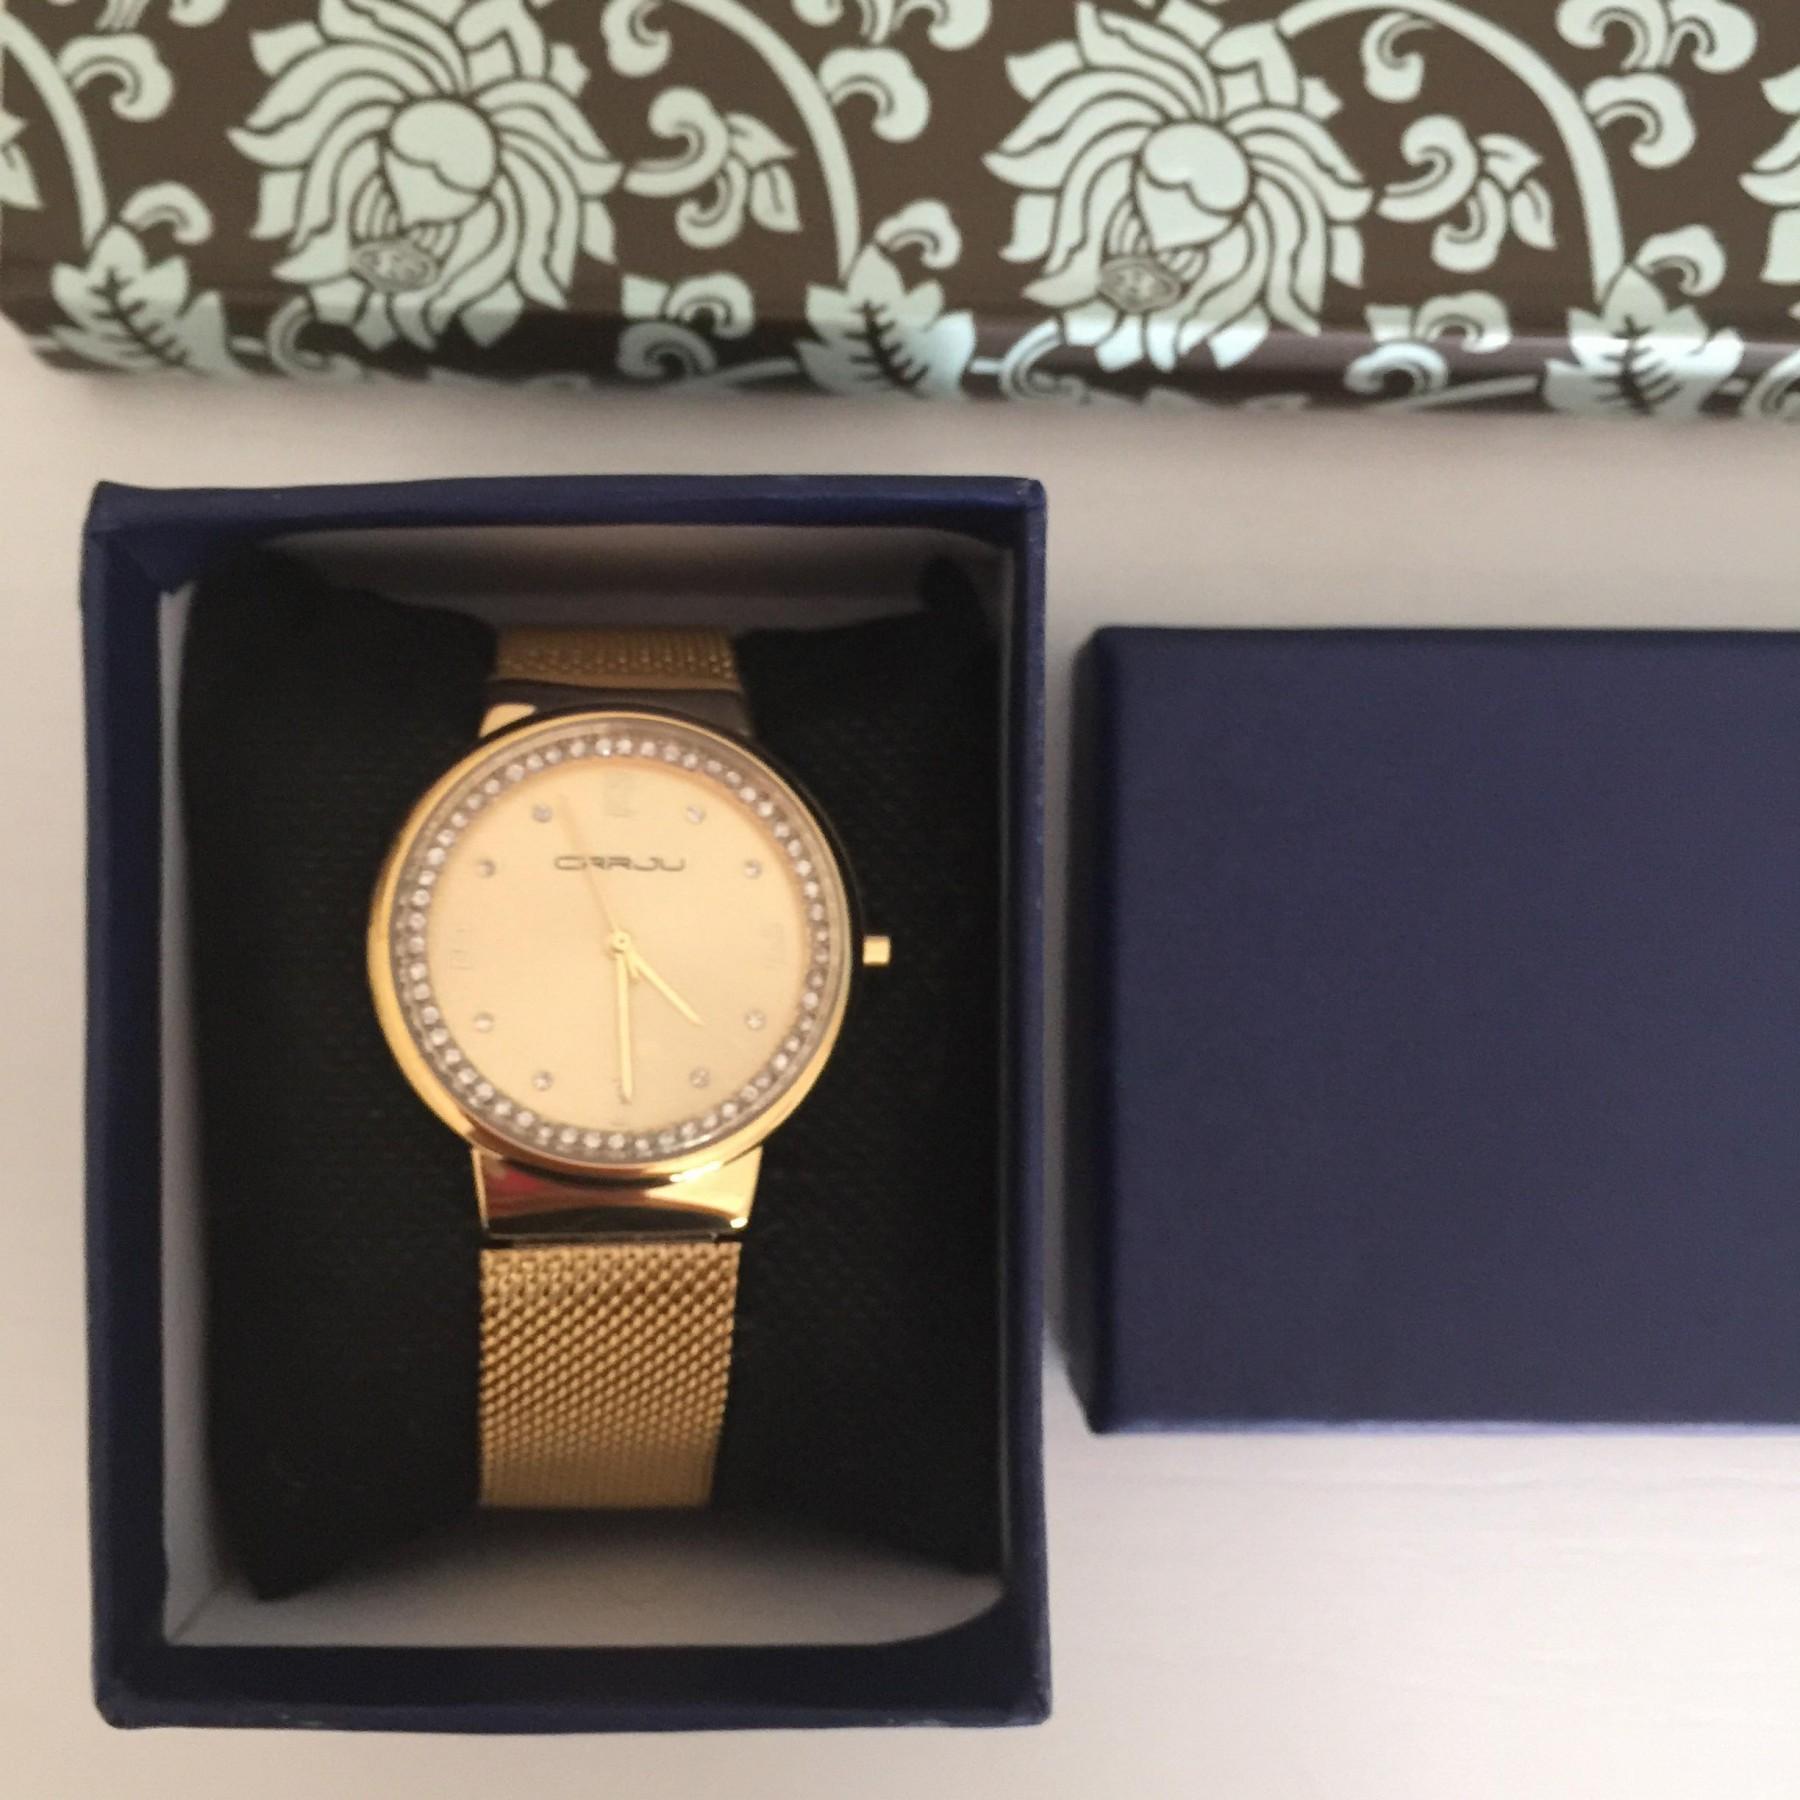 un orologio bello ed elegante